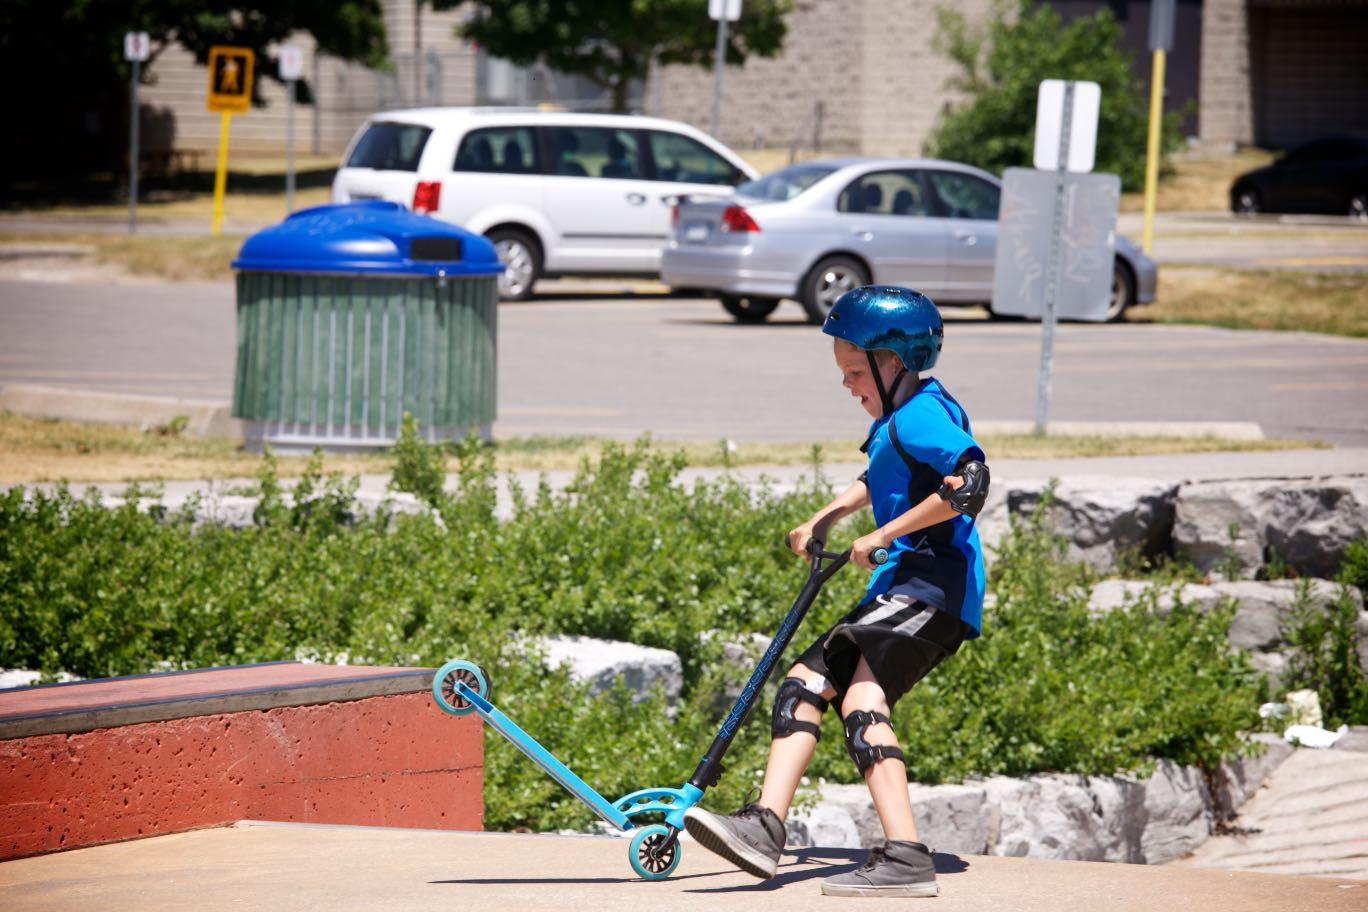 scooter-tricks